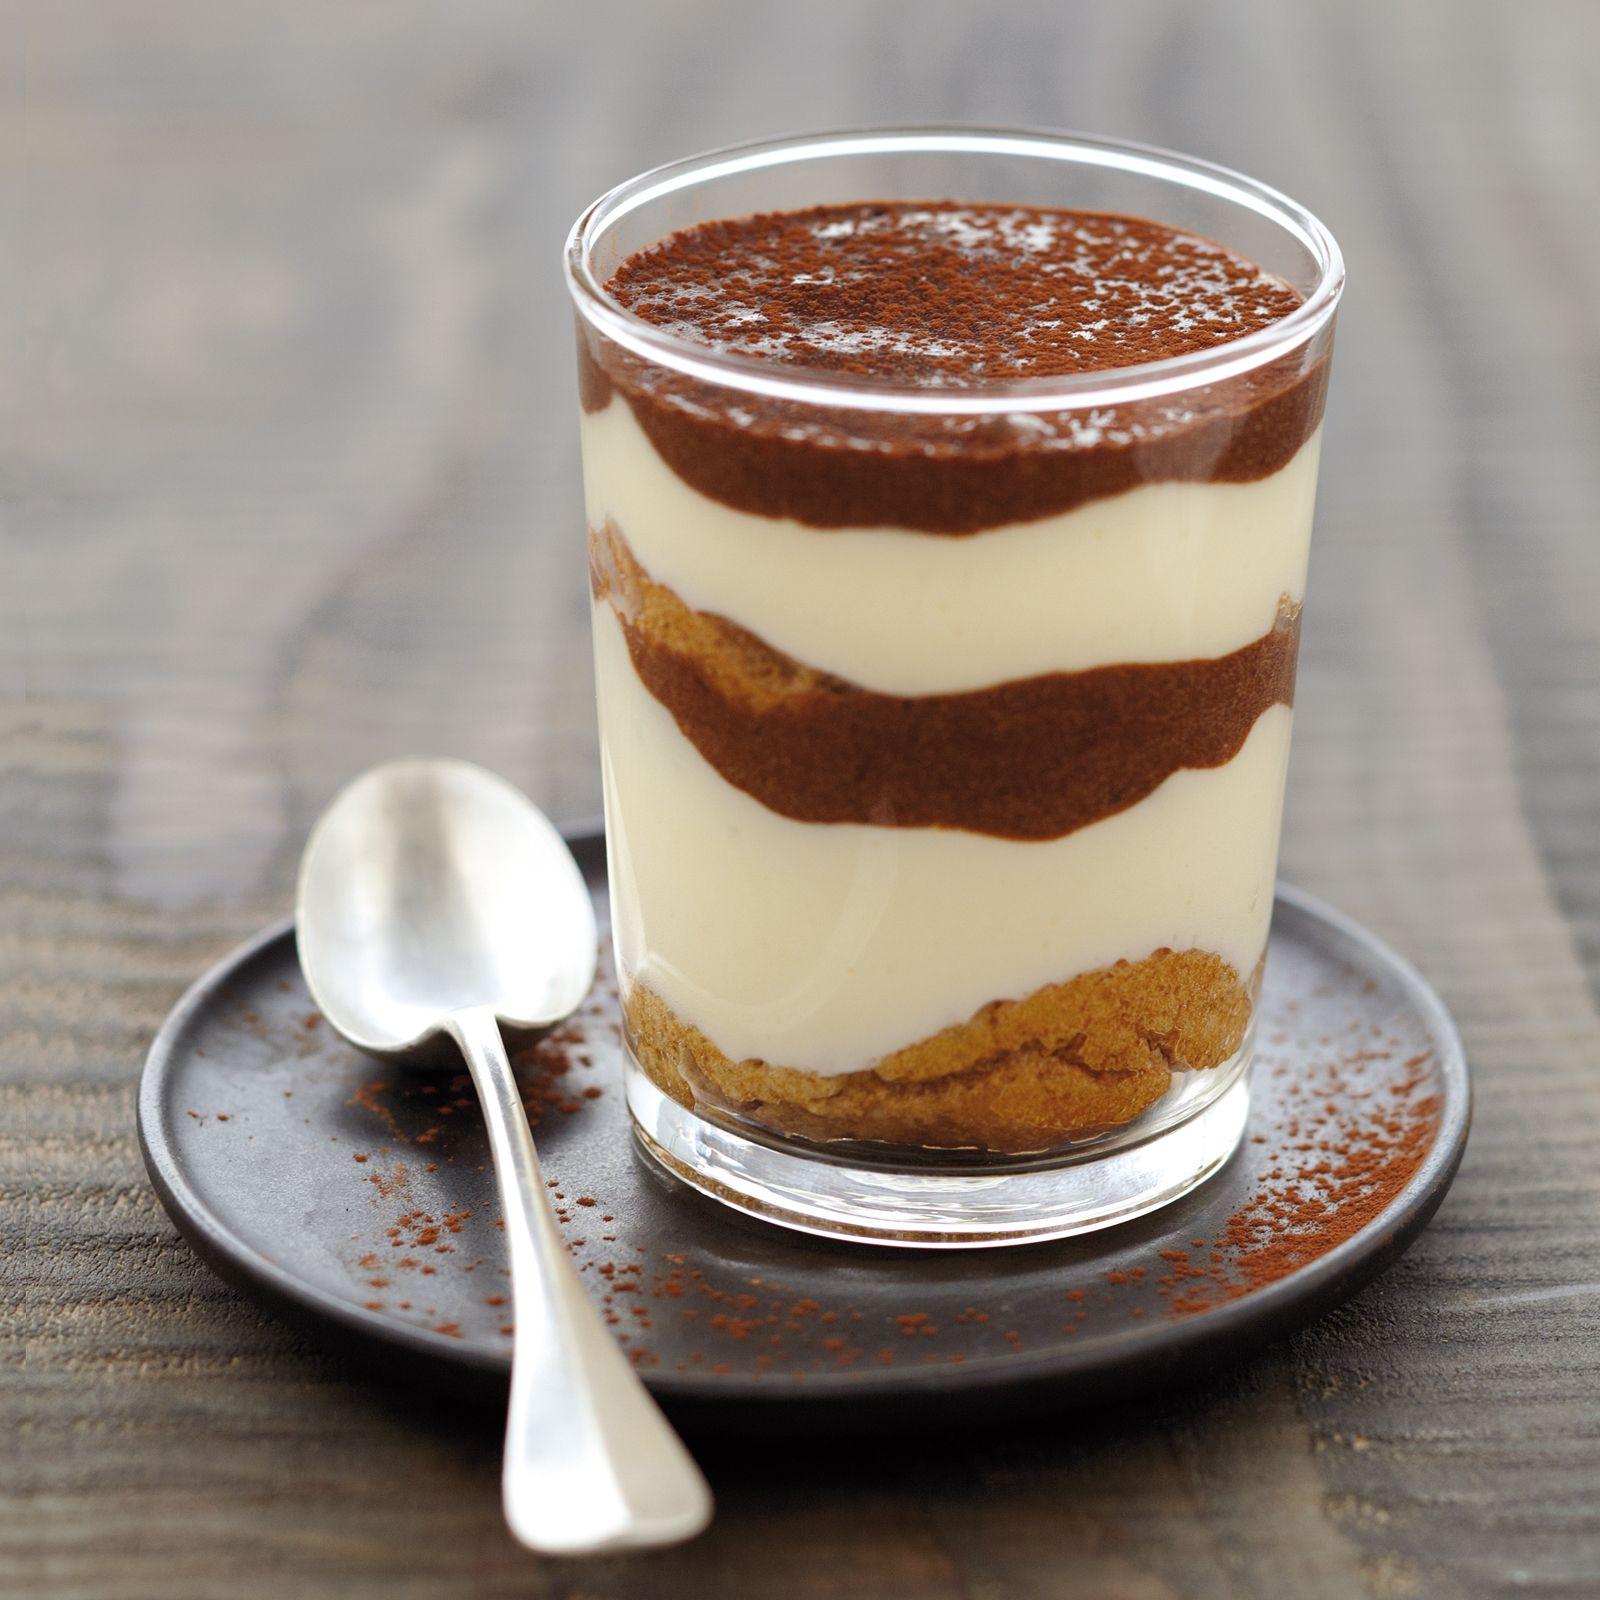 recette tiramisu chocolat facile rapide